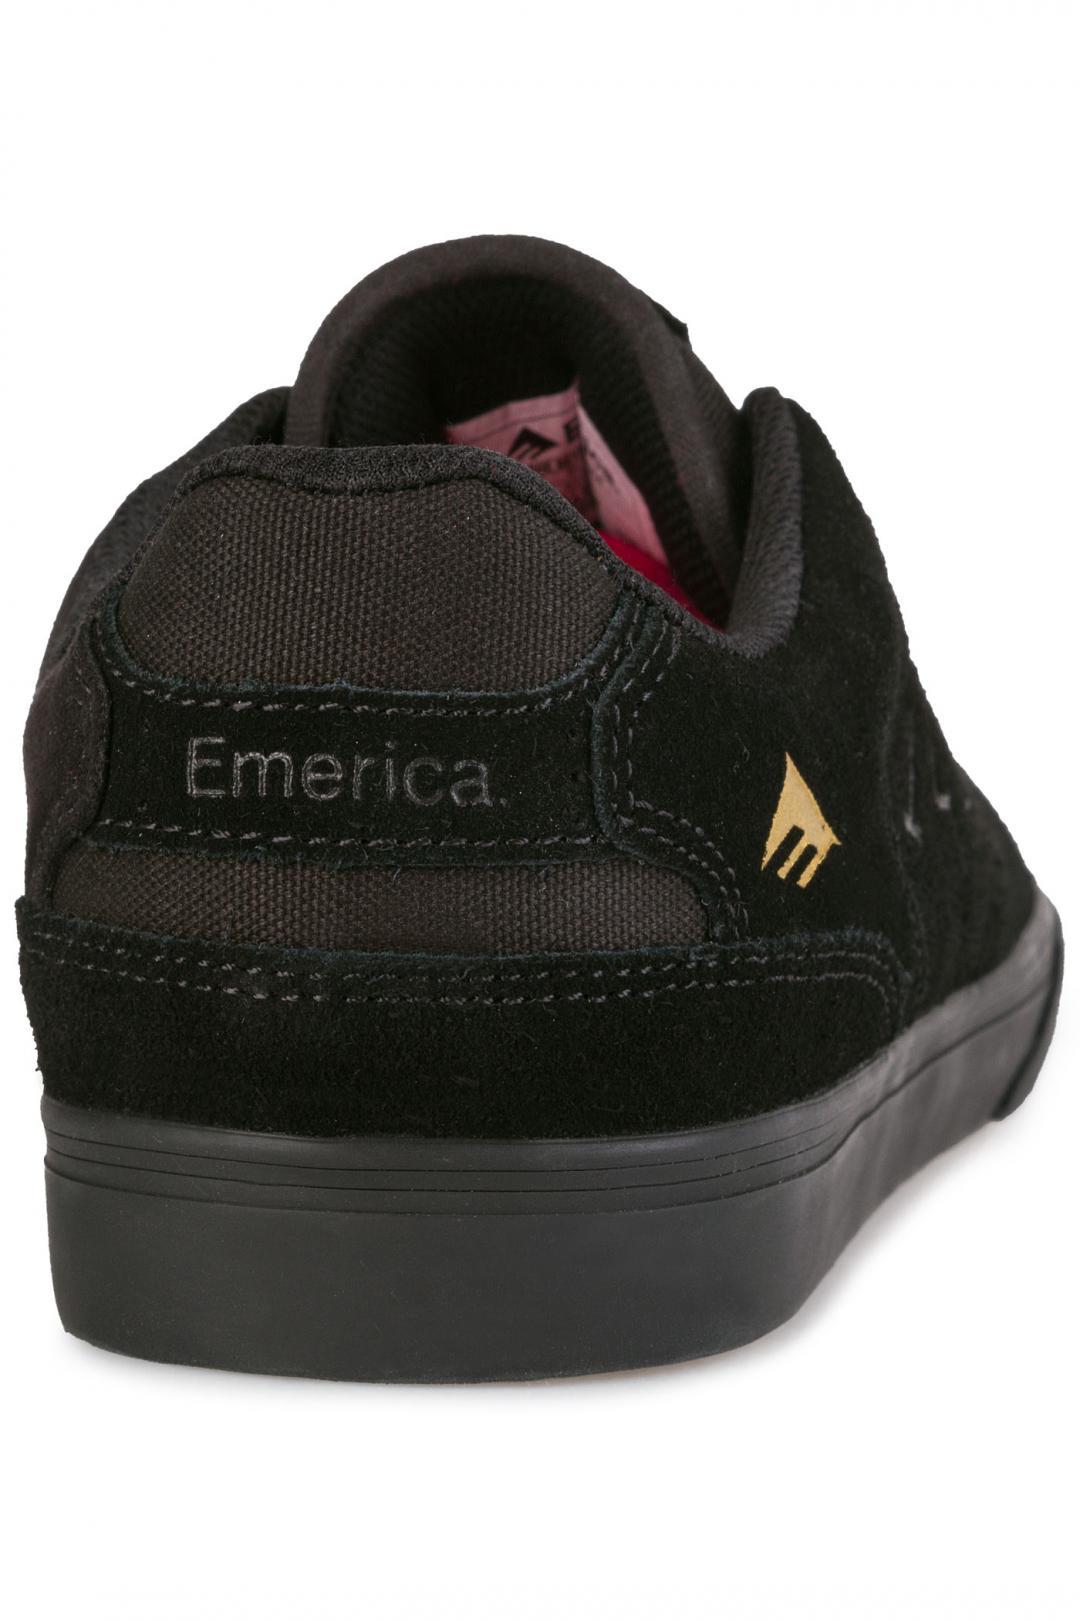 Uomo Emerica The Reynolds Low Vulc black gold | Sneakers low top